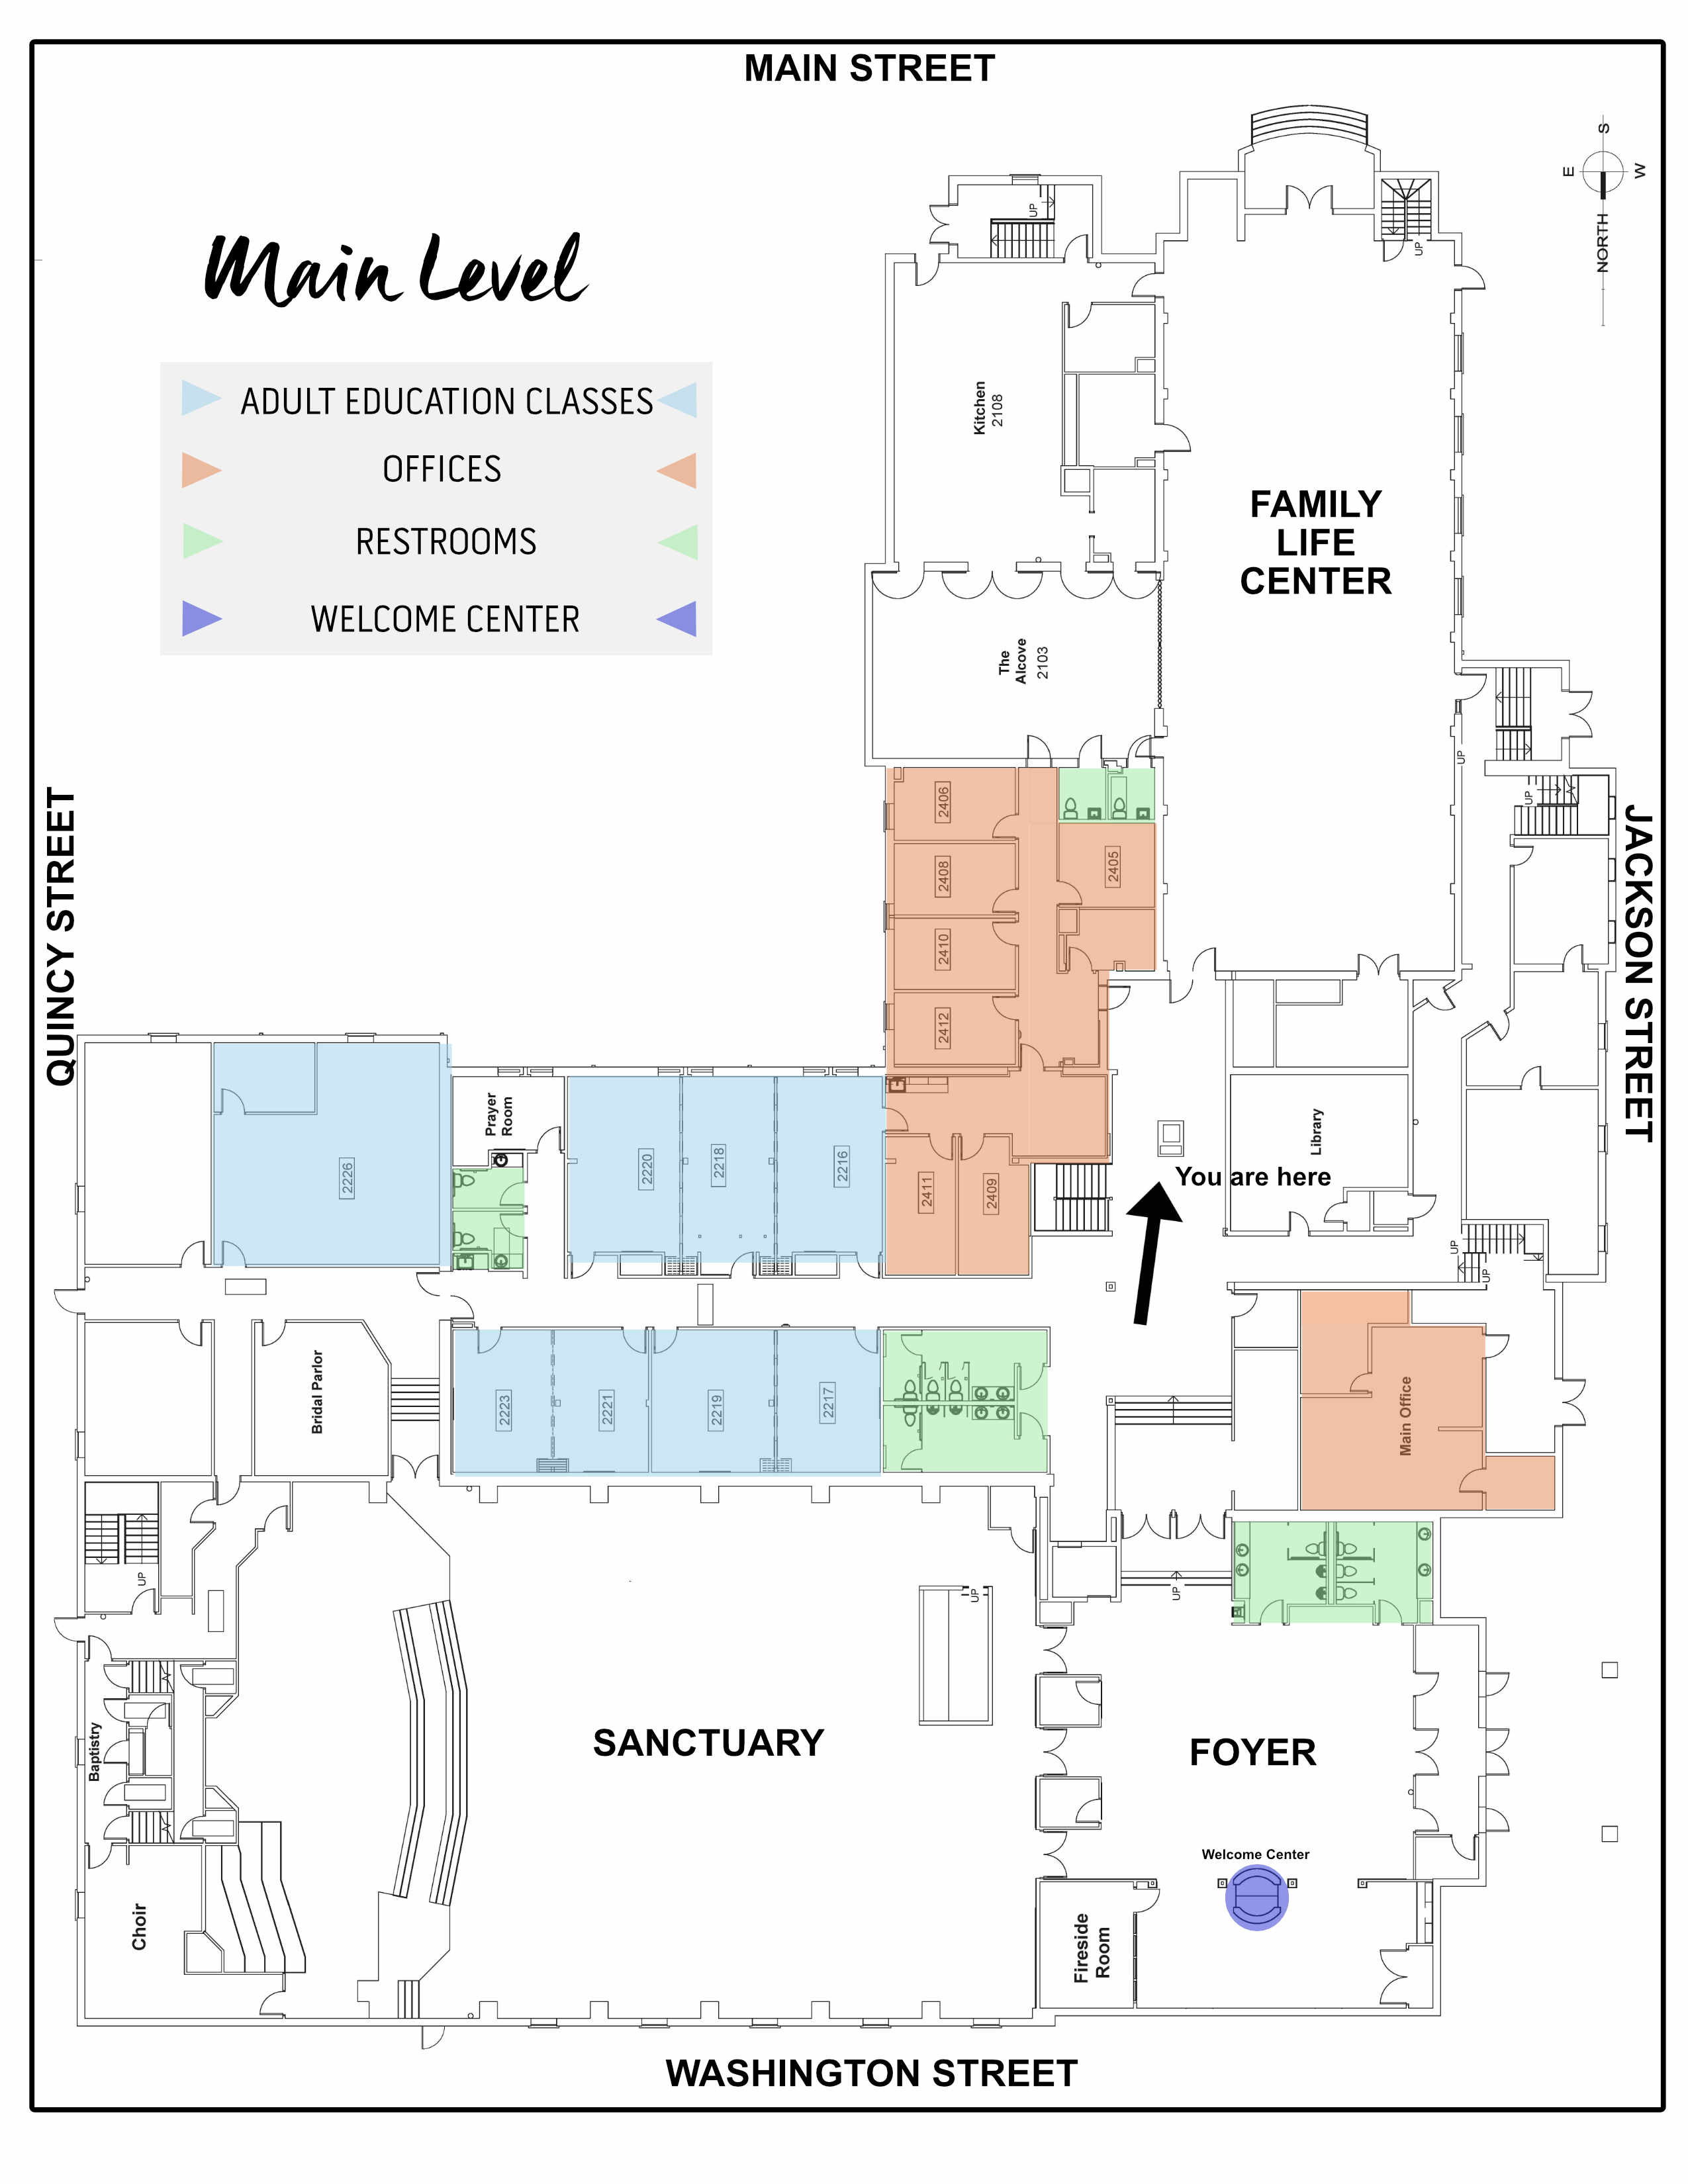 Main Level Map